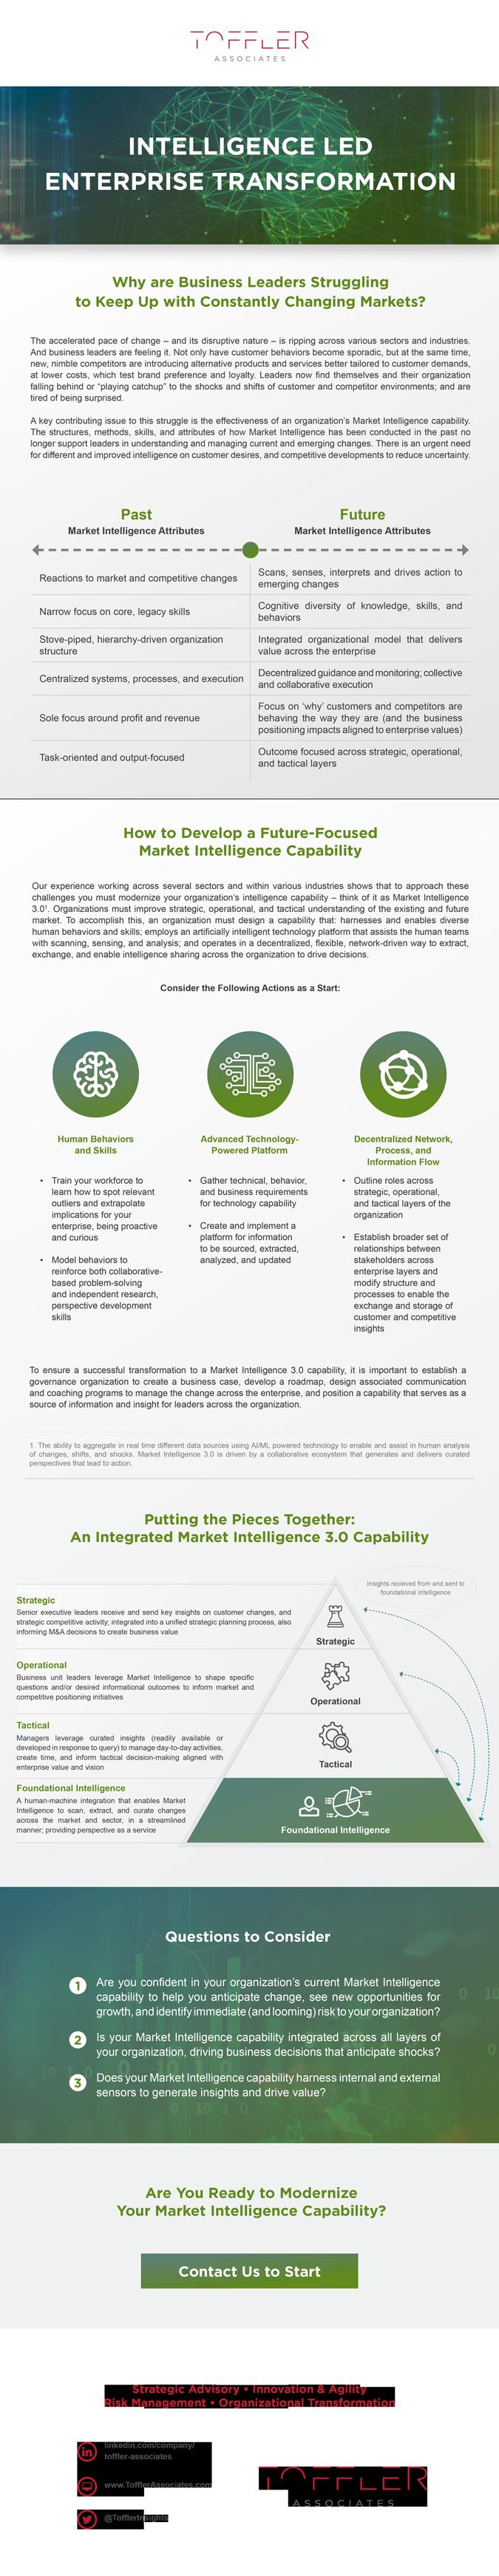 Intelligence Led Enterprise Transformation Infographic